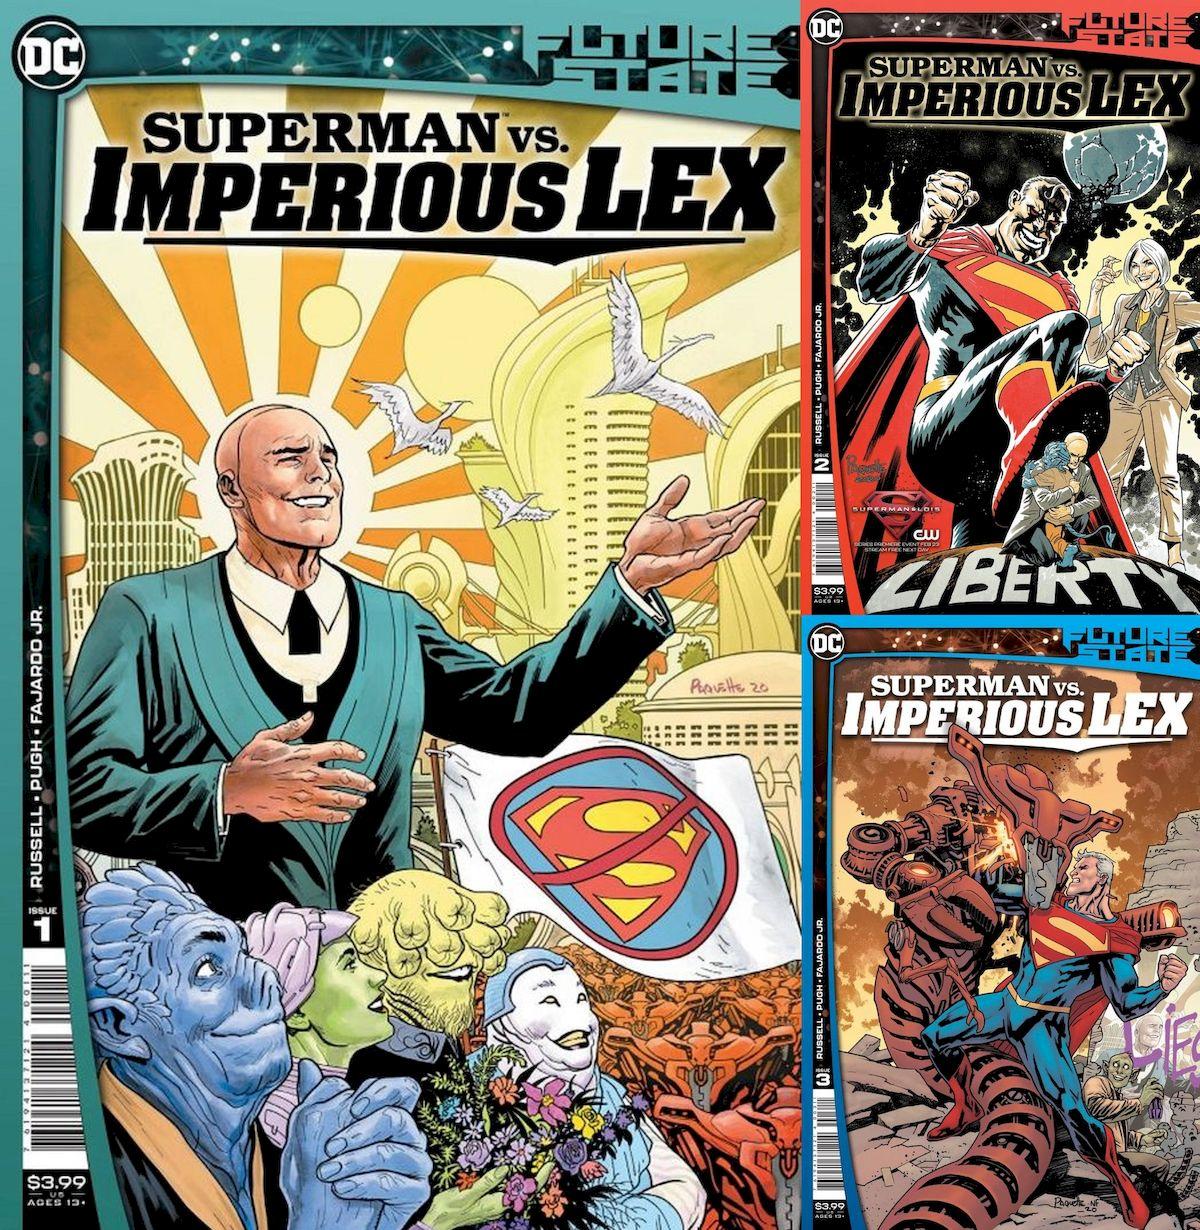 FUTURE STATE SUPERMAN VS IMPERIOUS LEX #1 - #3 (OF 3) SET